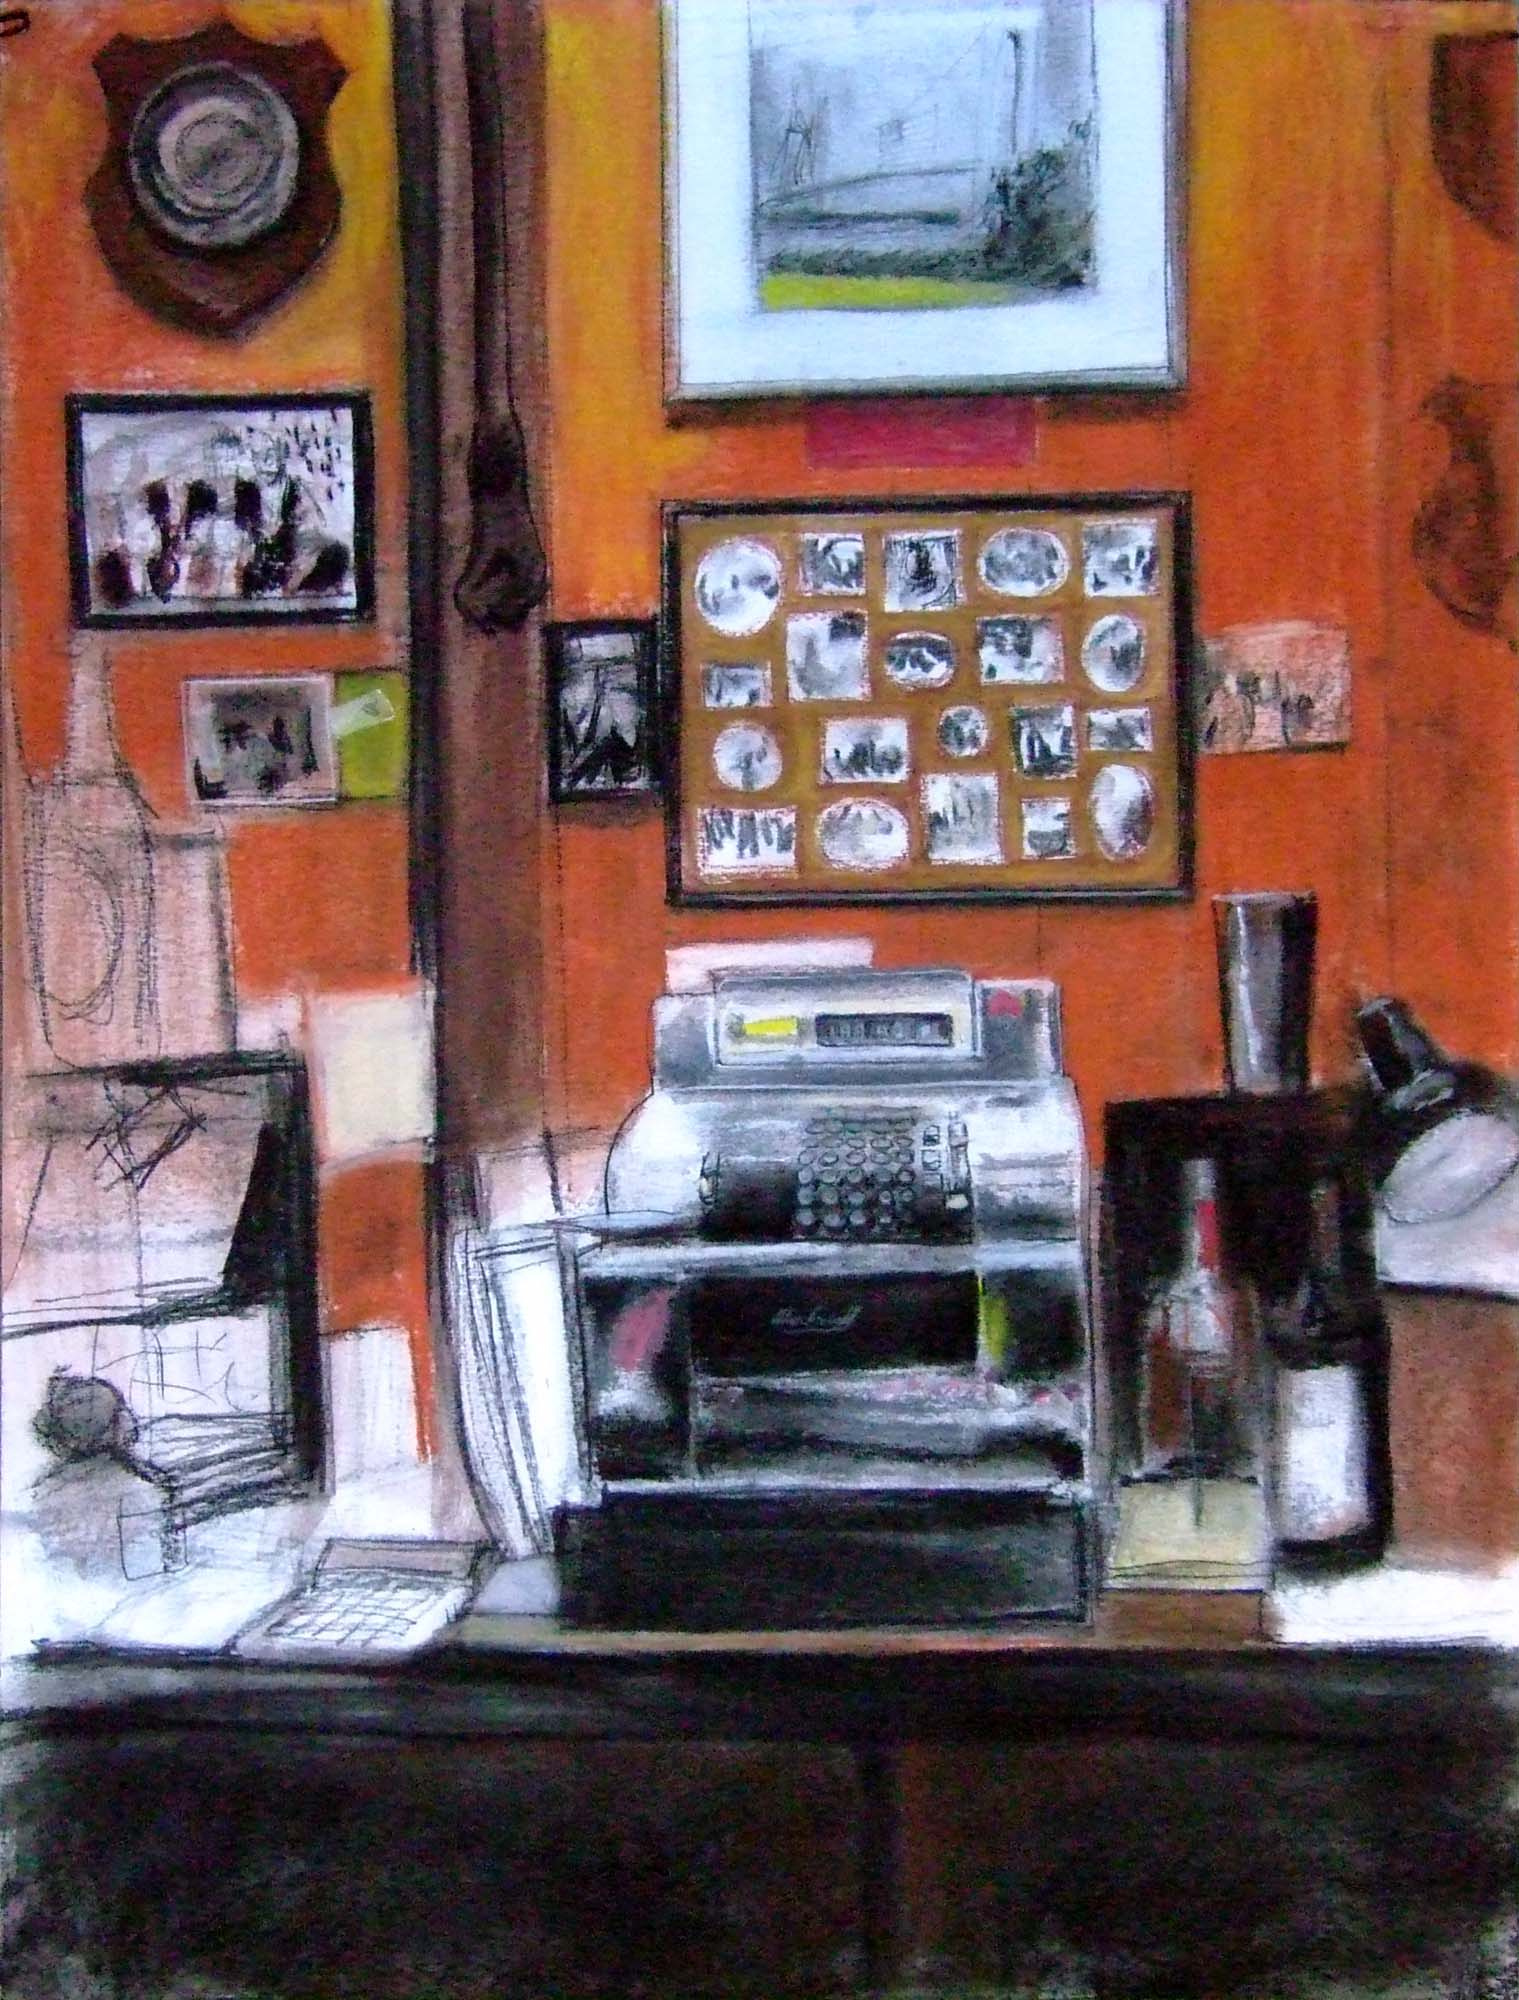 Colandrea's New Corner, cash register